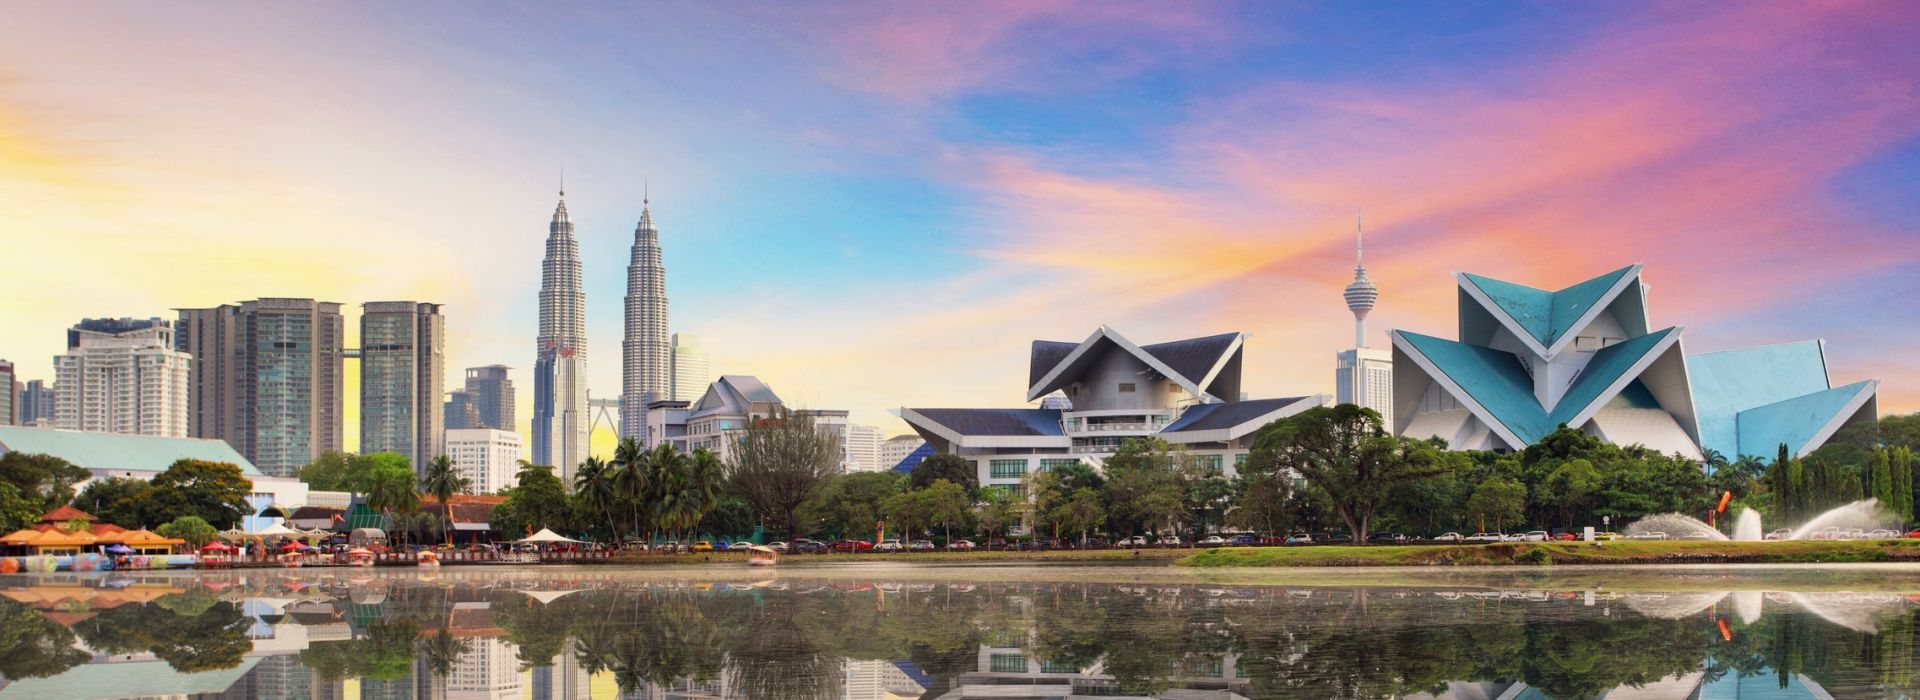 Natural landmarks sightseeing Tours in Malaysia